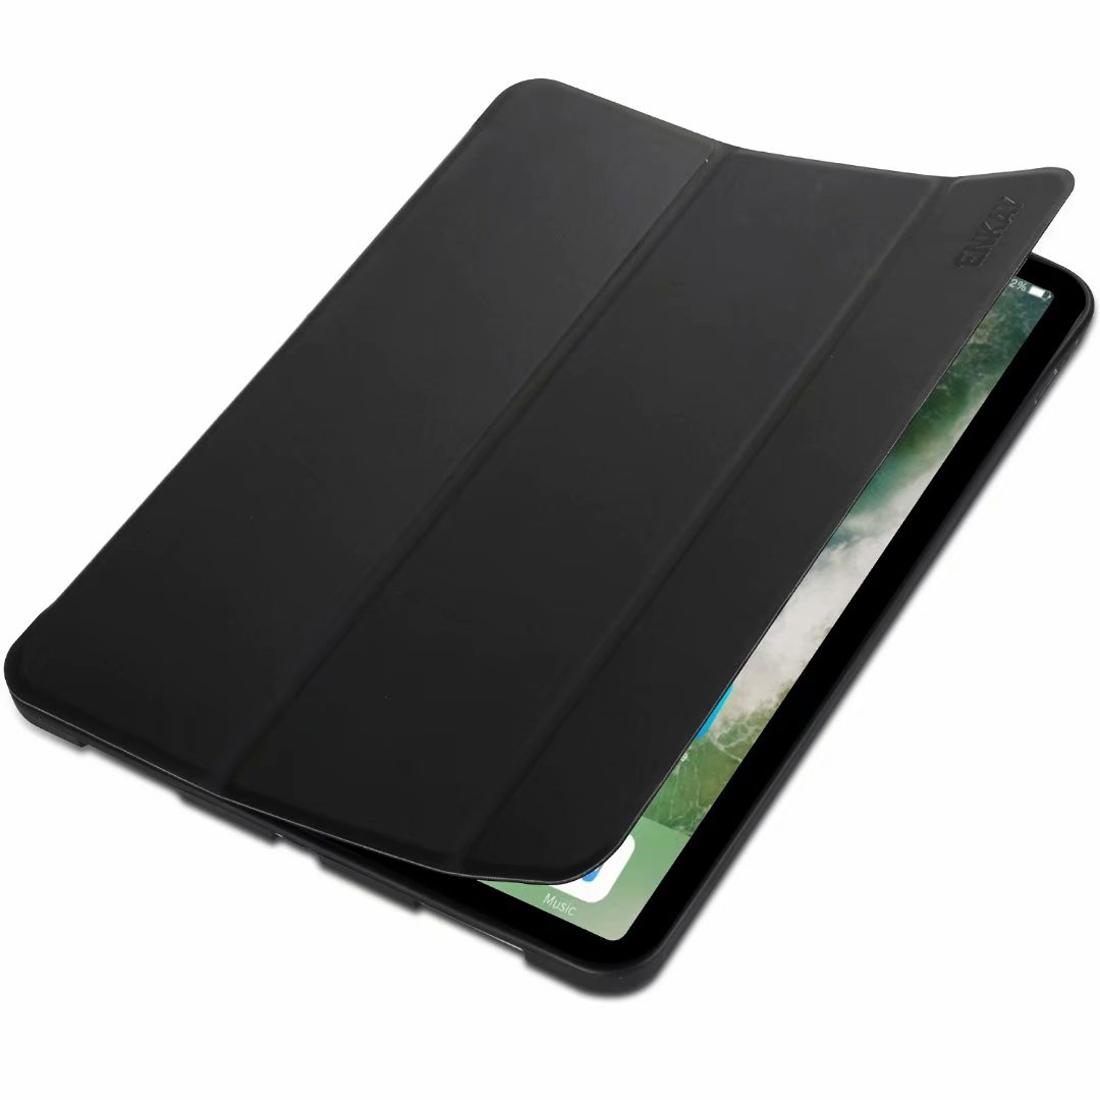 ENKAY Lambskin Texture + TPU Bottom Case Horizontal Flip Leather Case for iPad Pro 11 inch (2018) with Three-folding Holder & Sleep / Wake-up Function (Black)